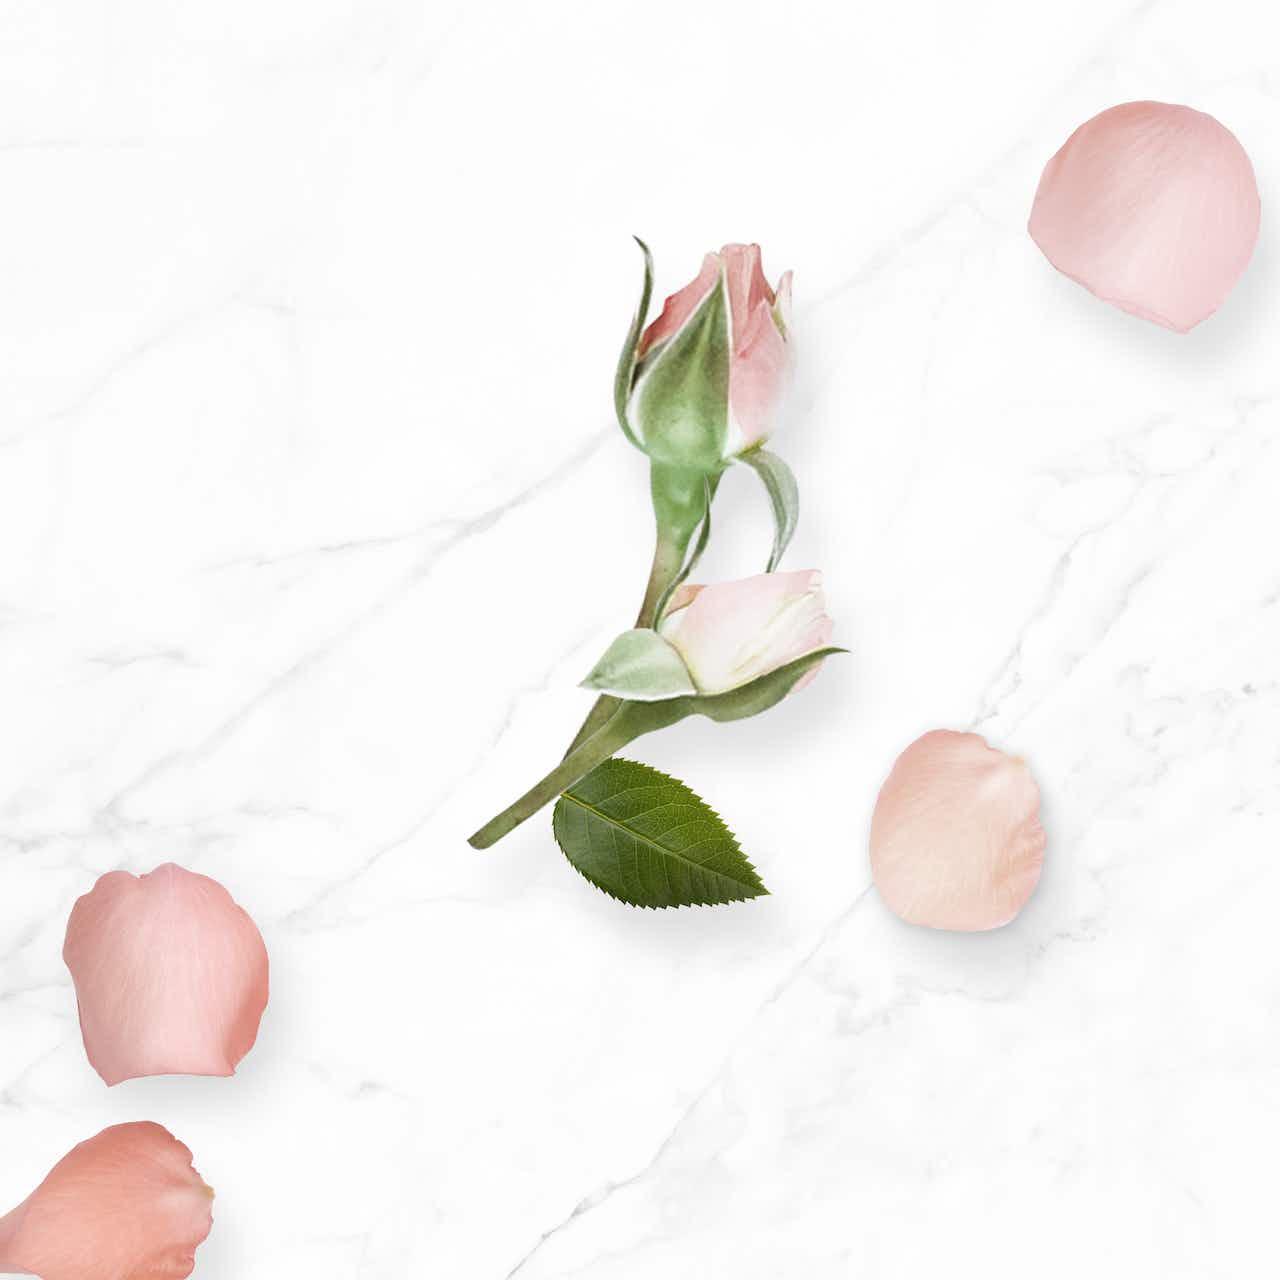 N.A.E. Inhaltsstoffe Bio-Damaszener Rose